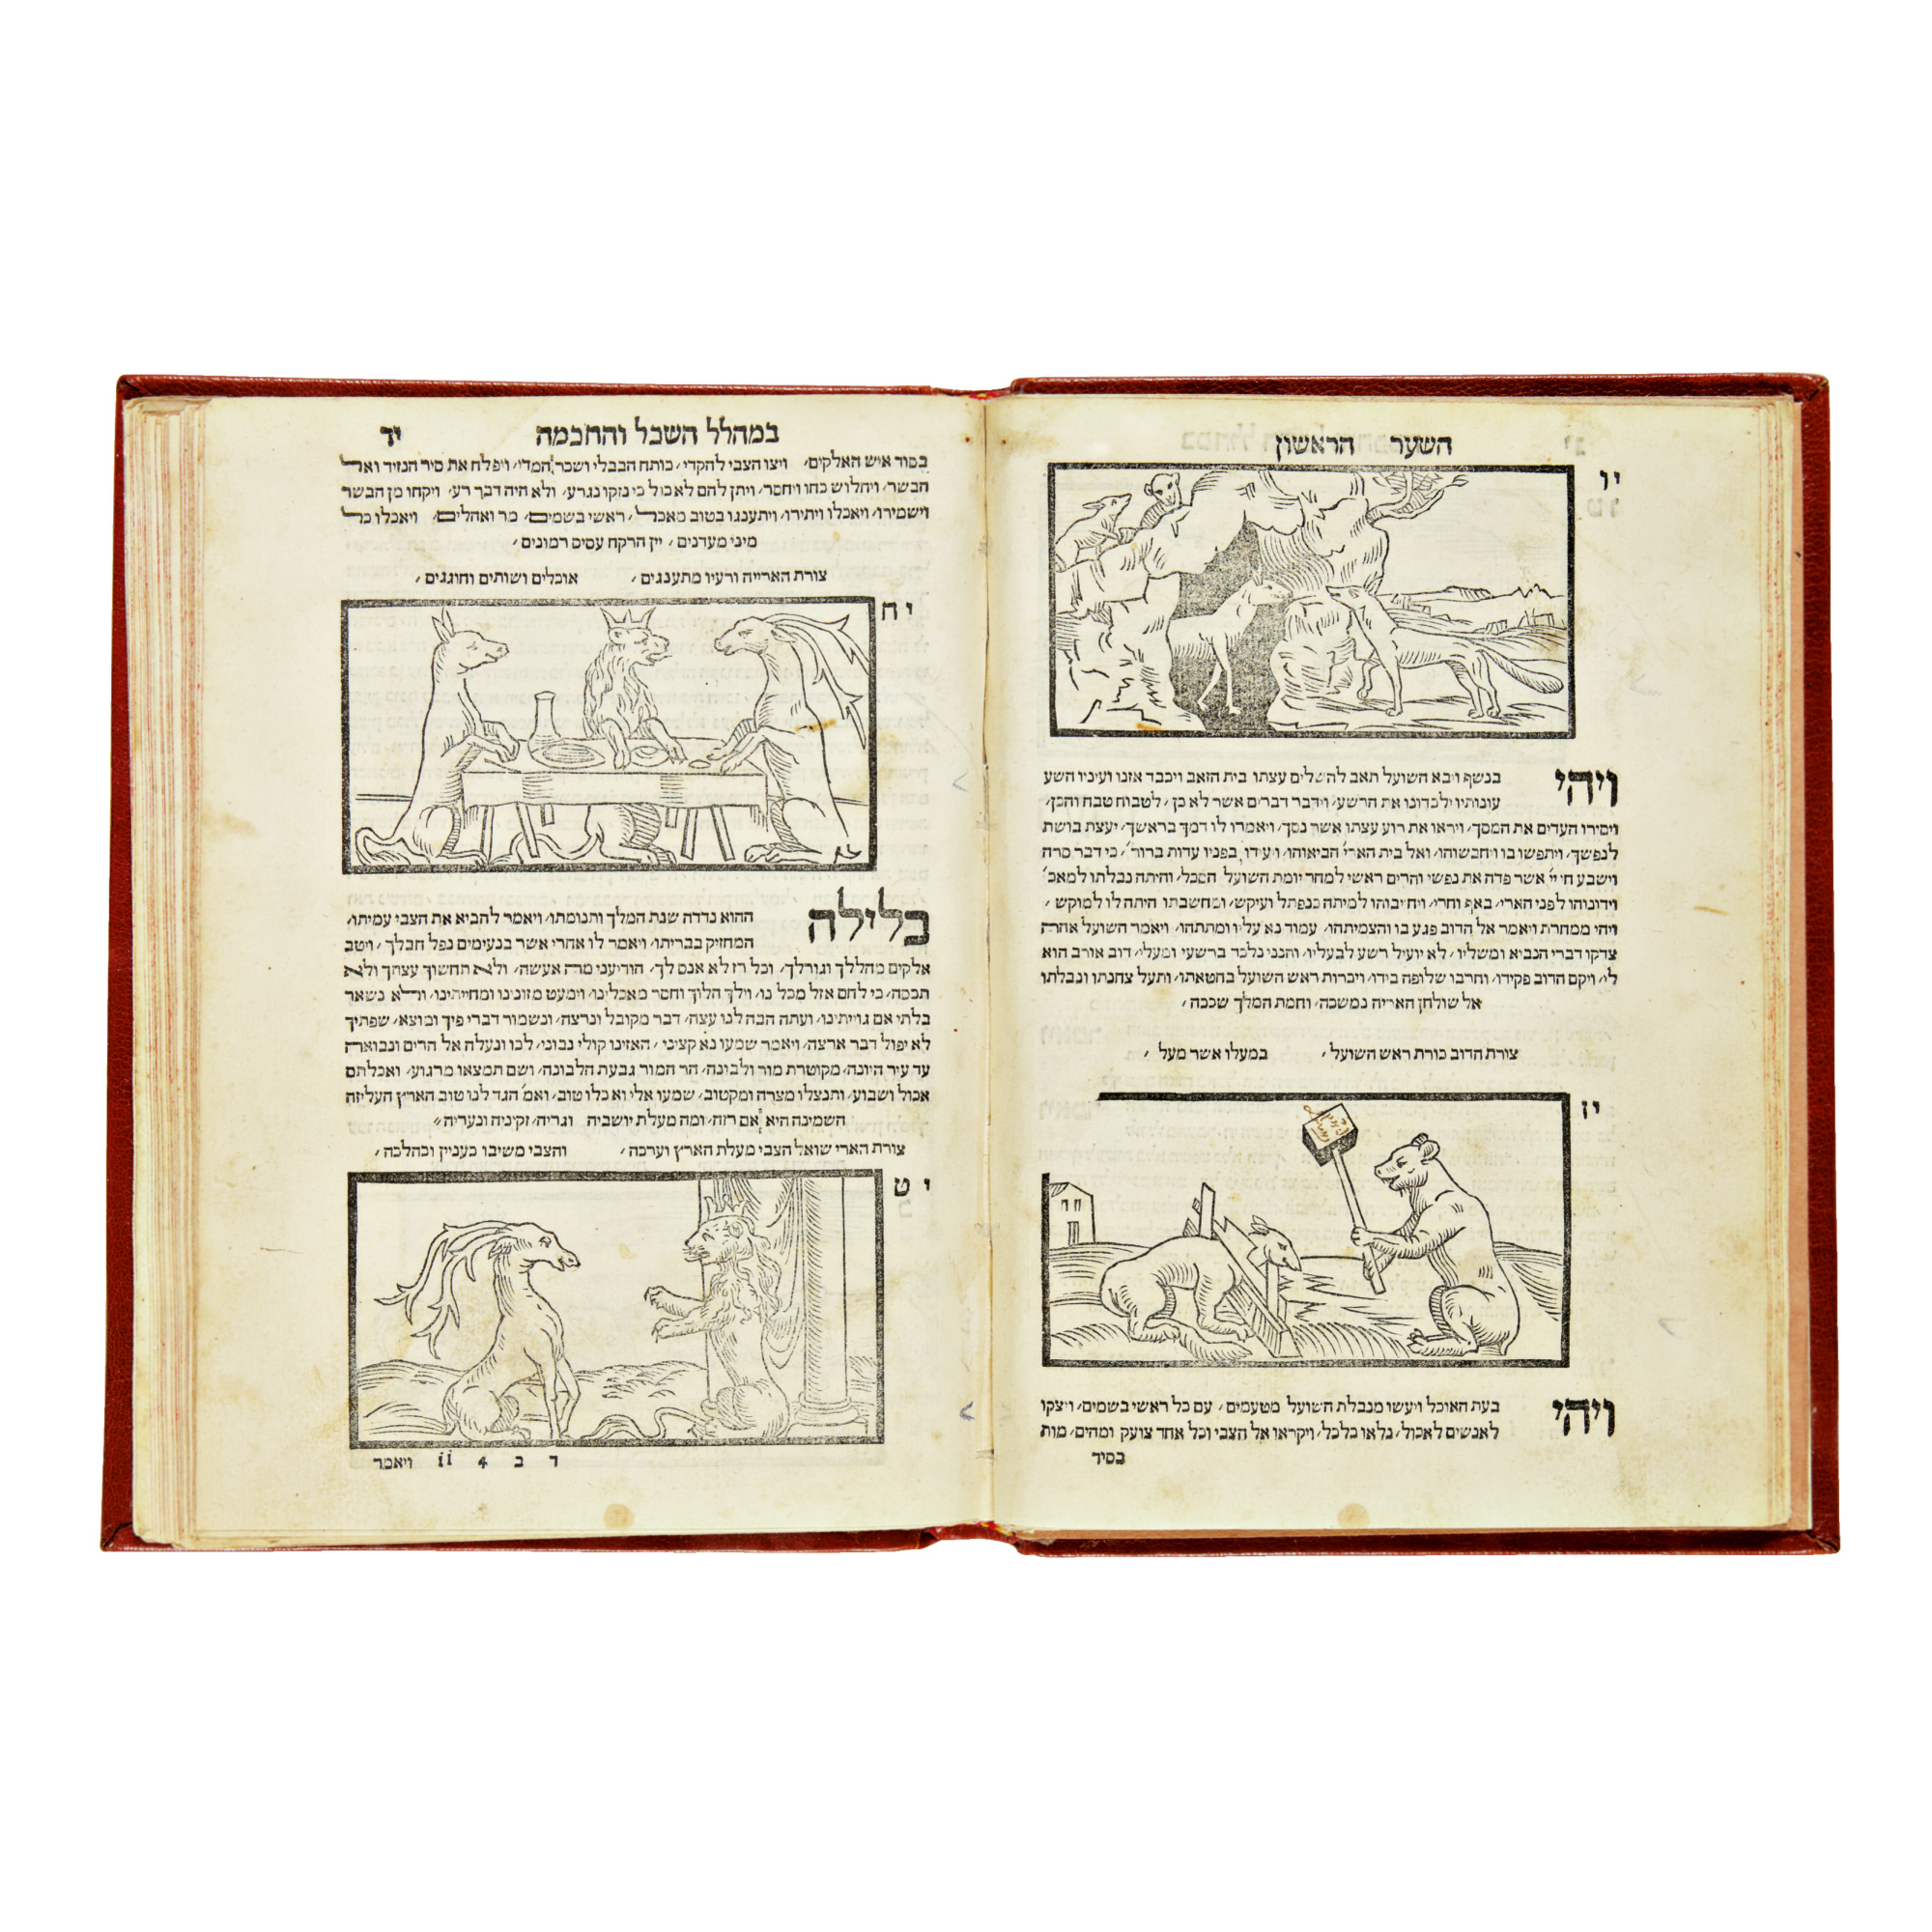 MESHAL HA-KADMONI (FABLES), ISAAC IBN SAHULA, [VENICE]: MEIR BEN JACOB PARENZO, [CA. 1546-1547]